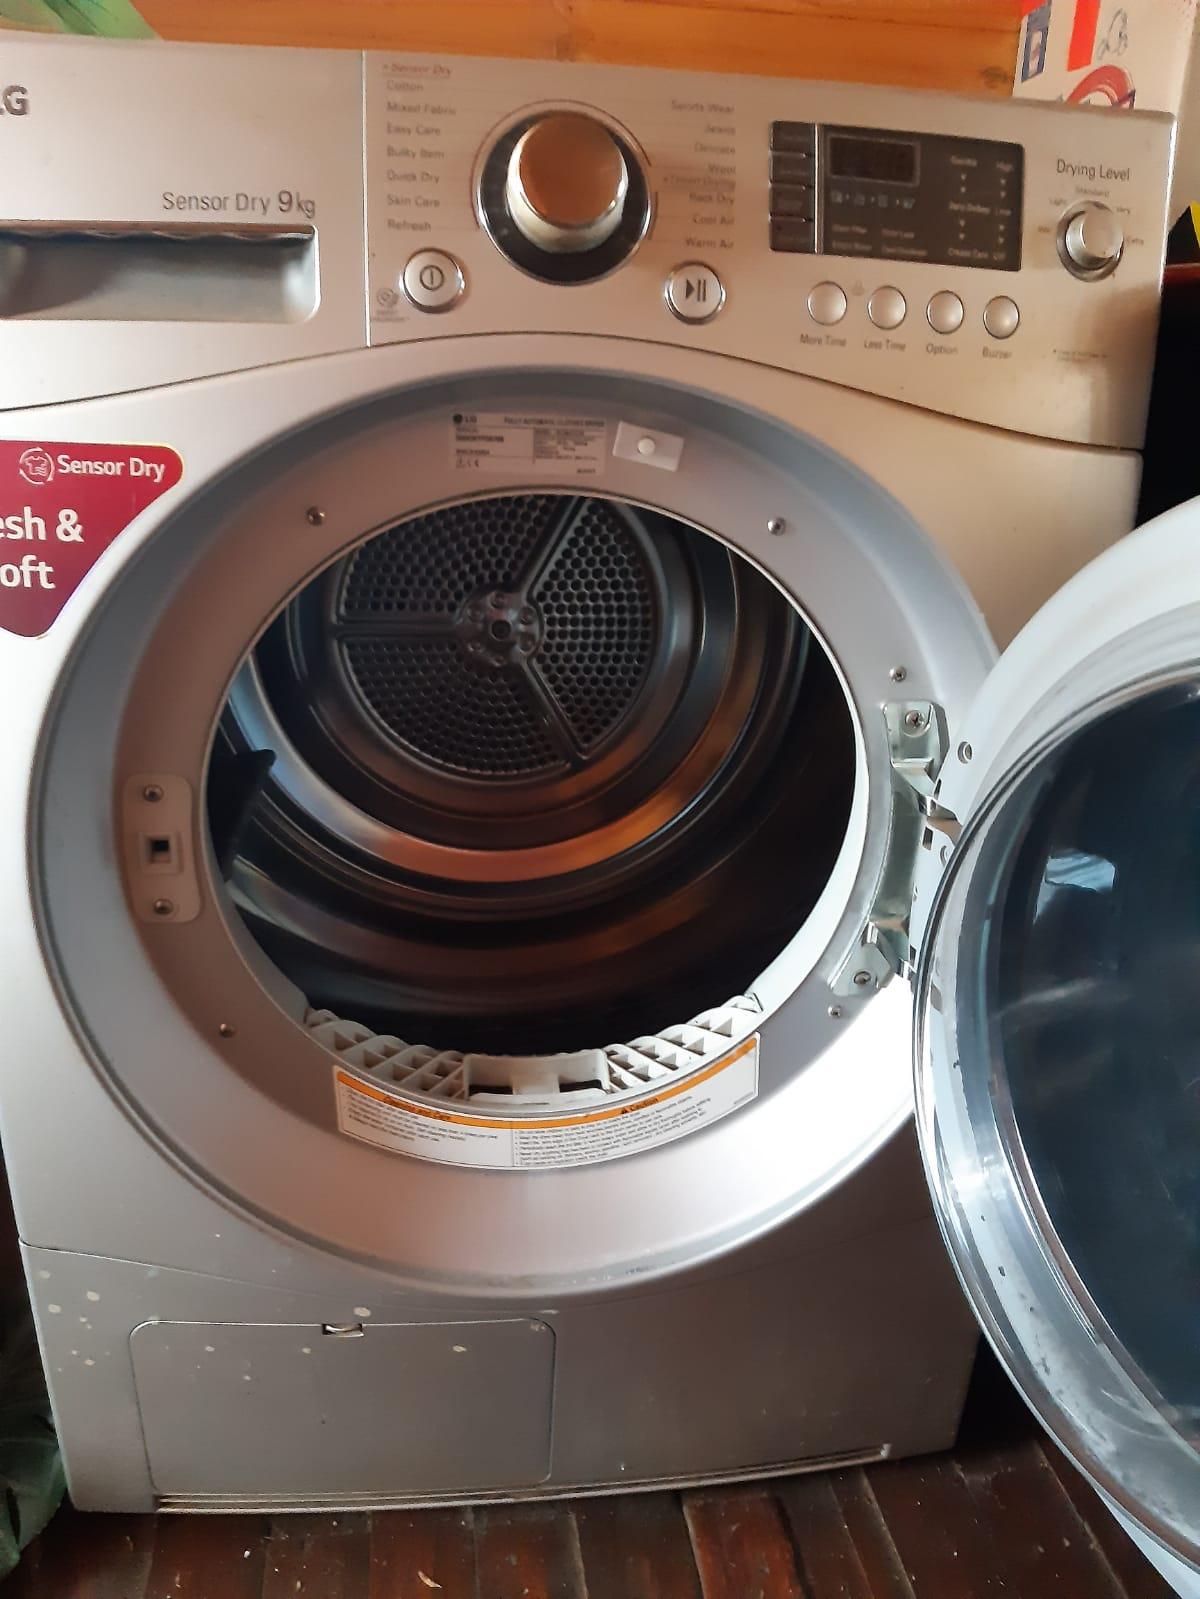 Selling a LG tumbler dryer